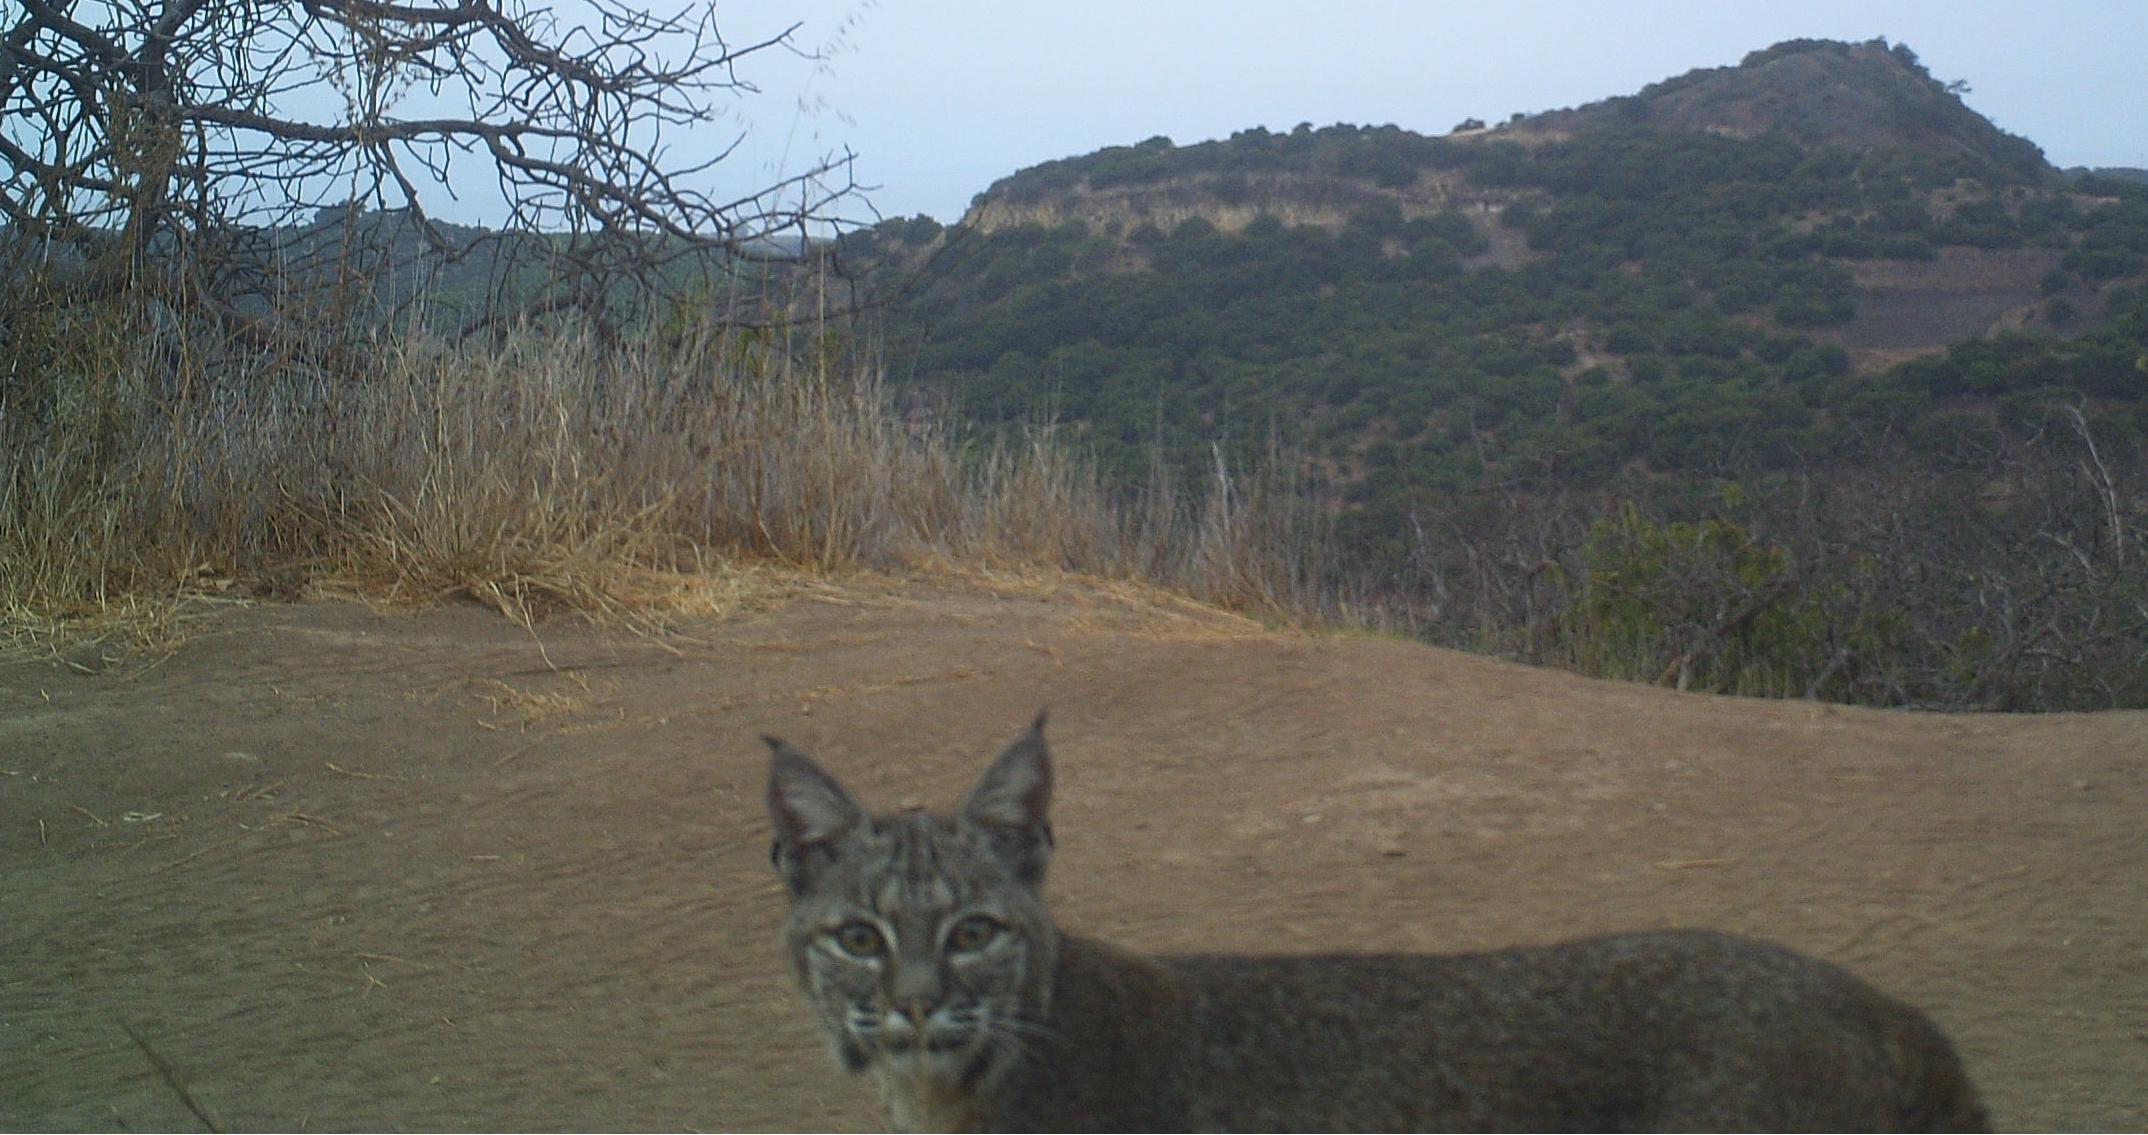 Critter-cam selfie of our resident bobcat.